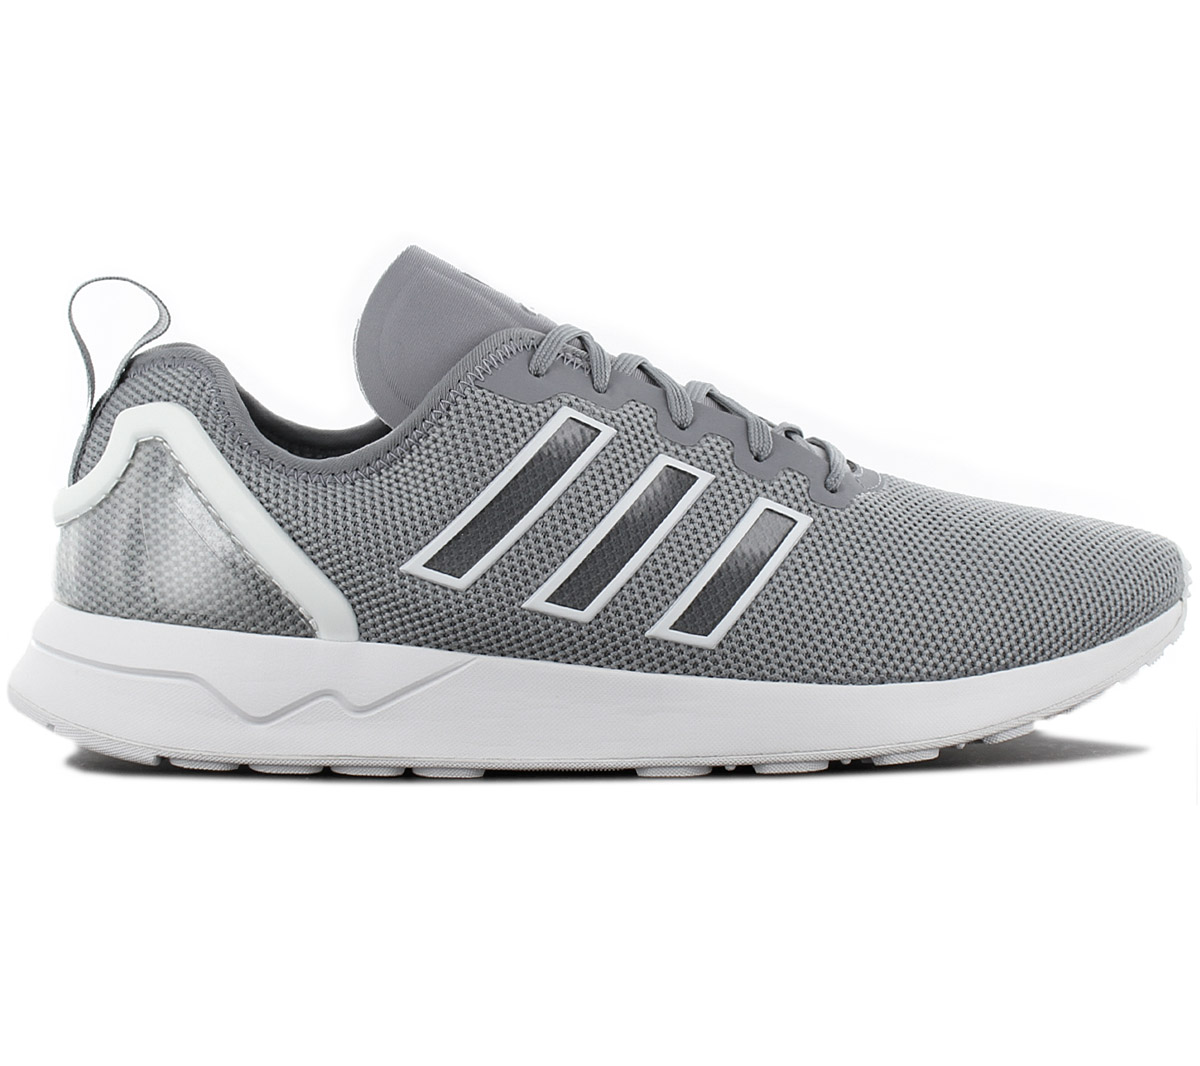 more photos d4225 93674 Details about Adidas Originals Zx Flux Adv Men's Sneakers Shoes Grey S79006  Sneakers New